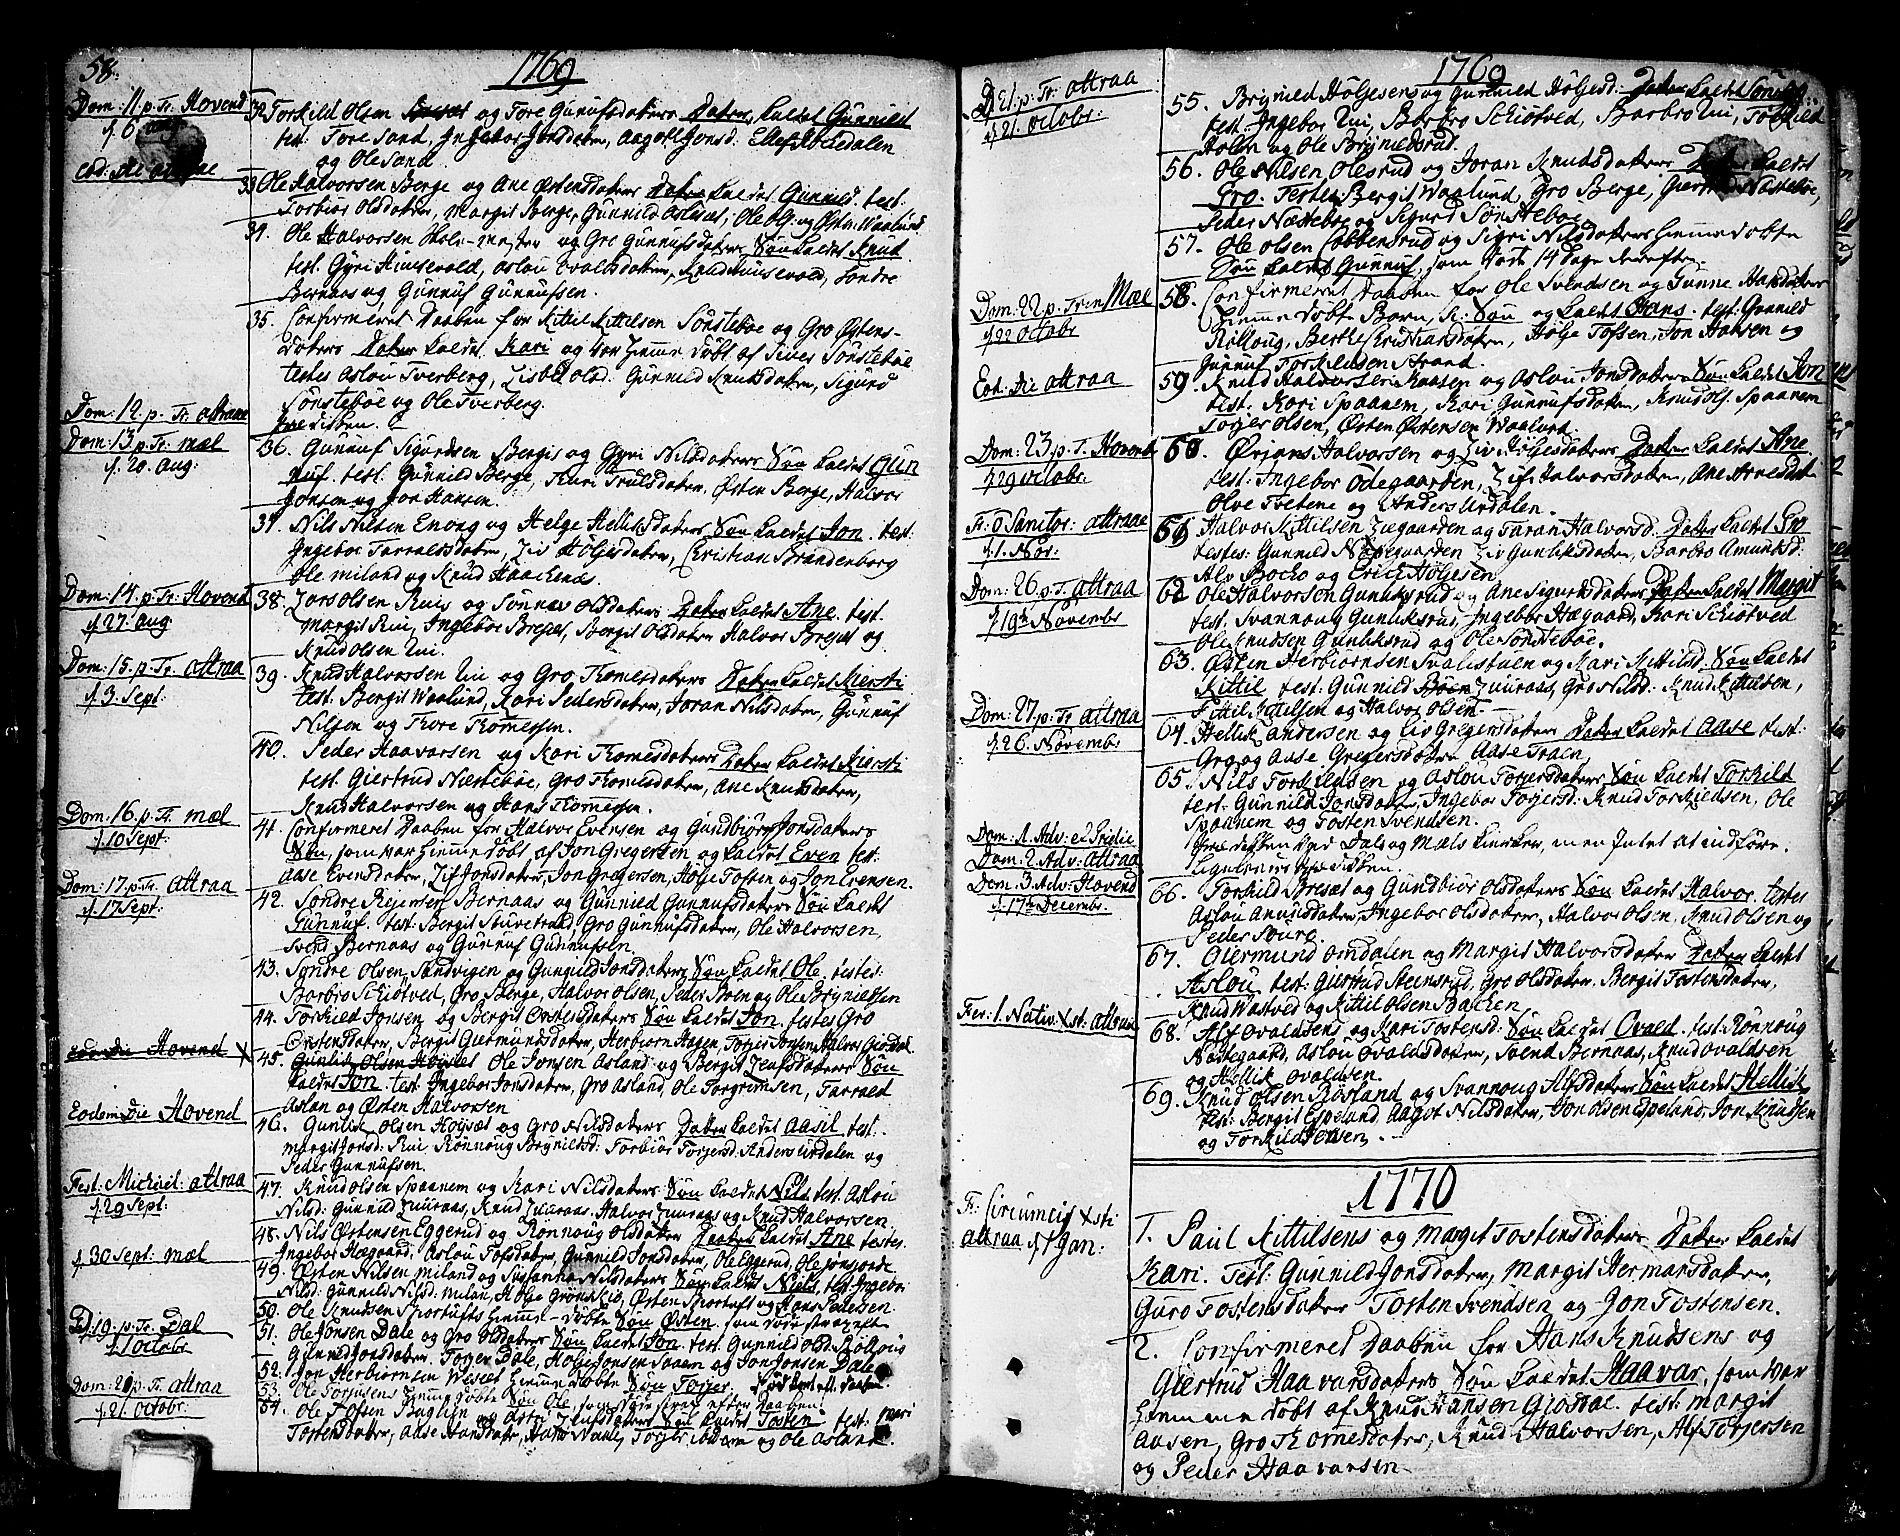 SAKO, Tinn kirkebøker, F/Fa/L0002: Ministerialbok nr. I 2, 1757-1810, s. 58-59